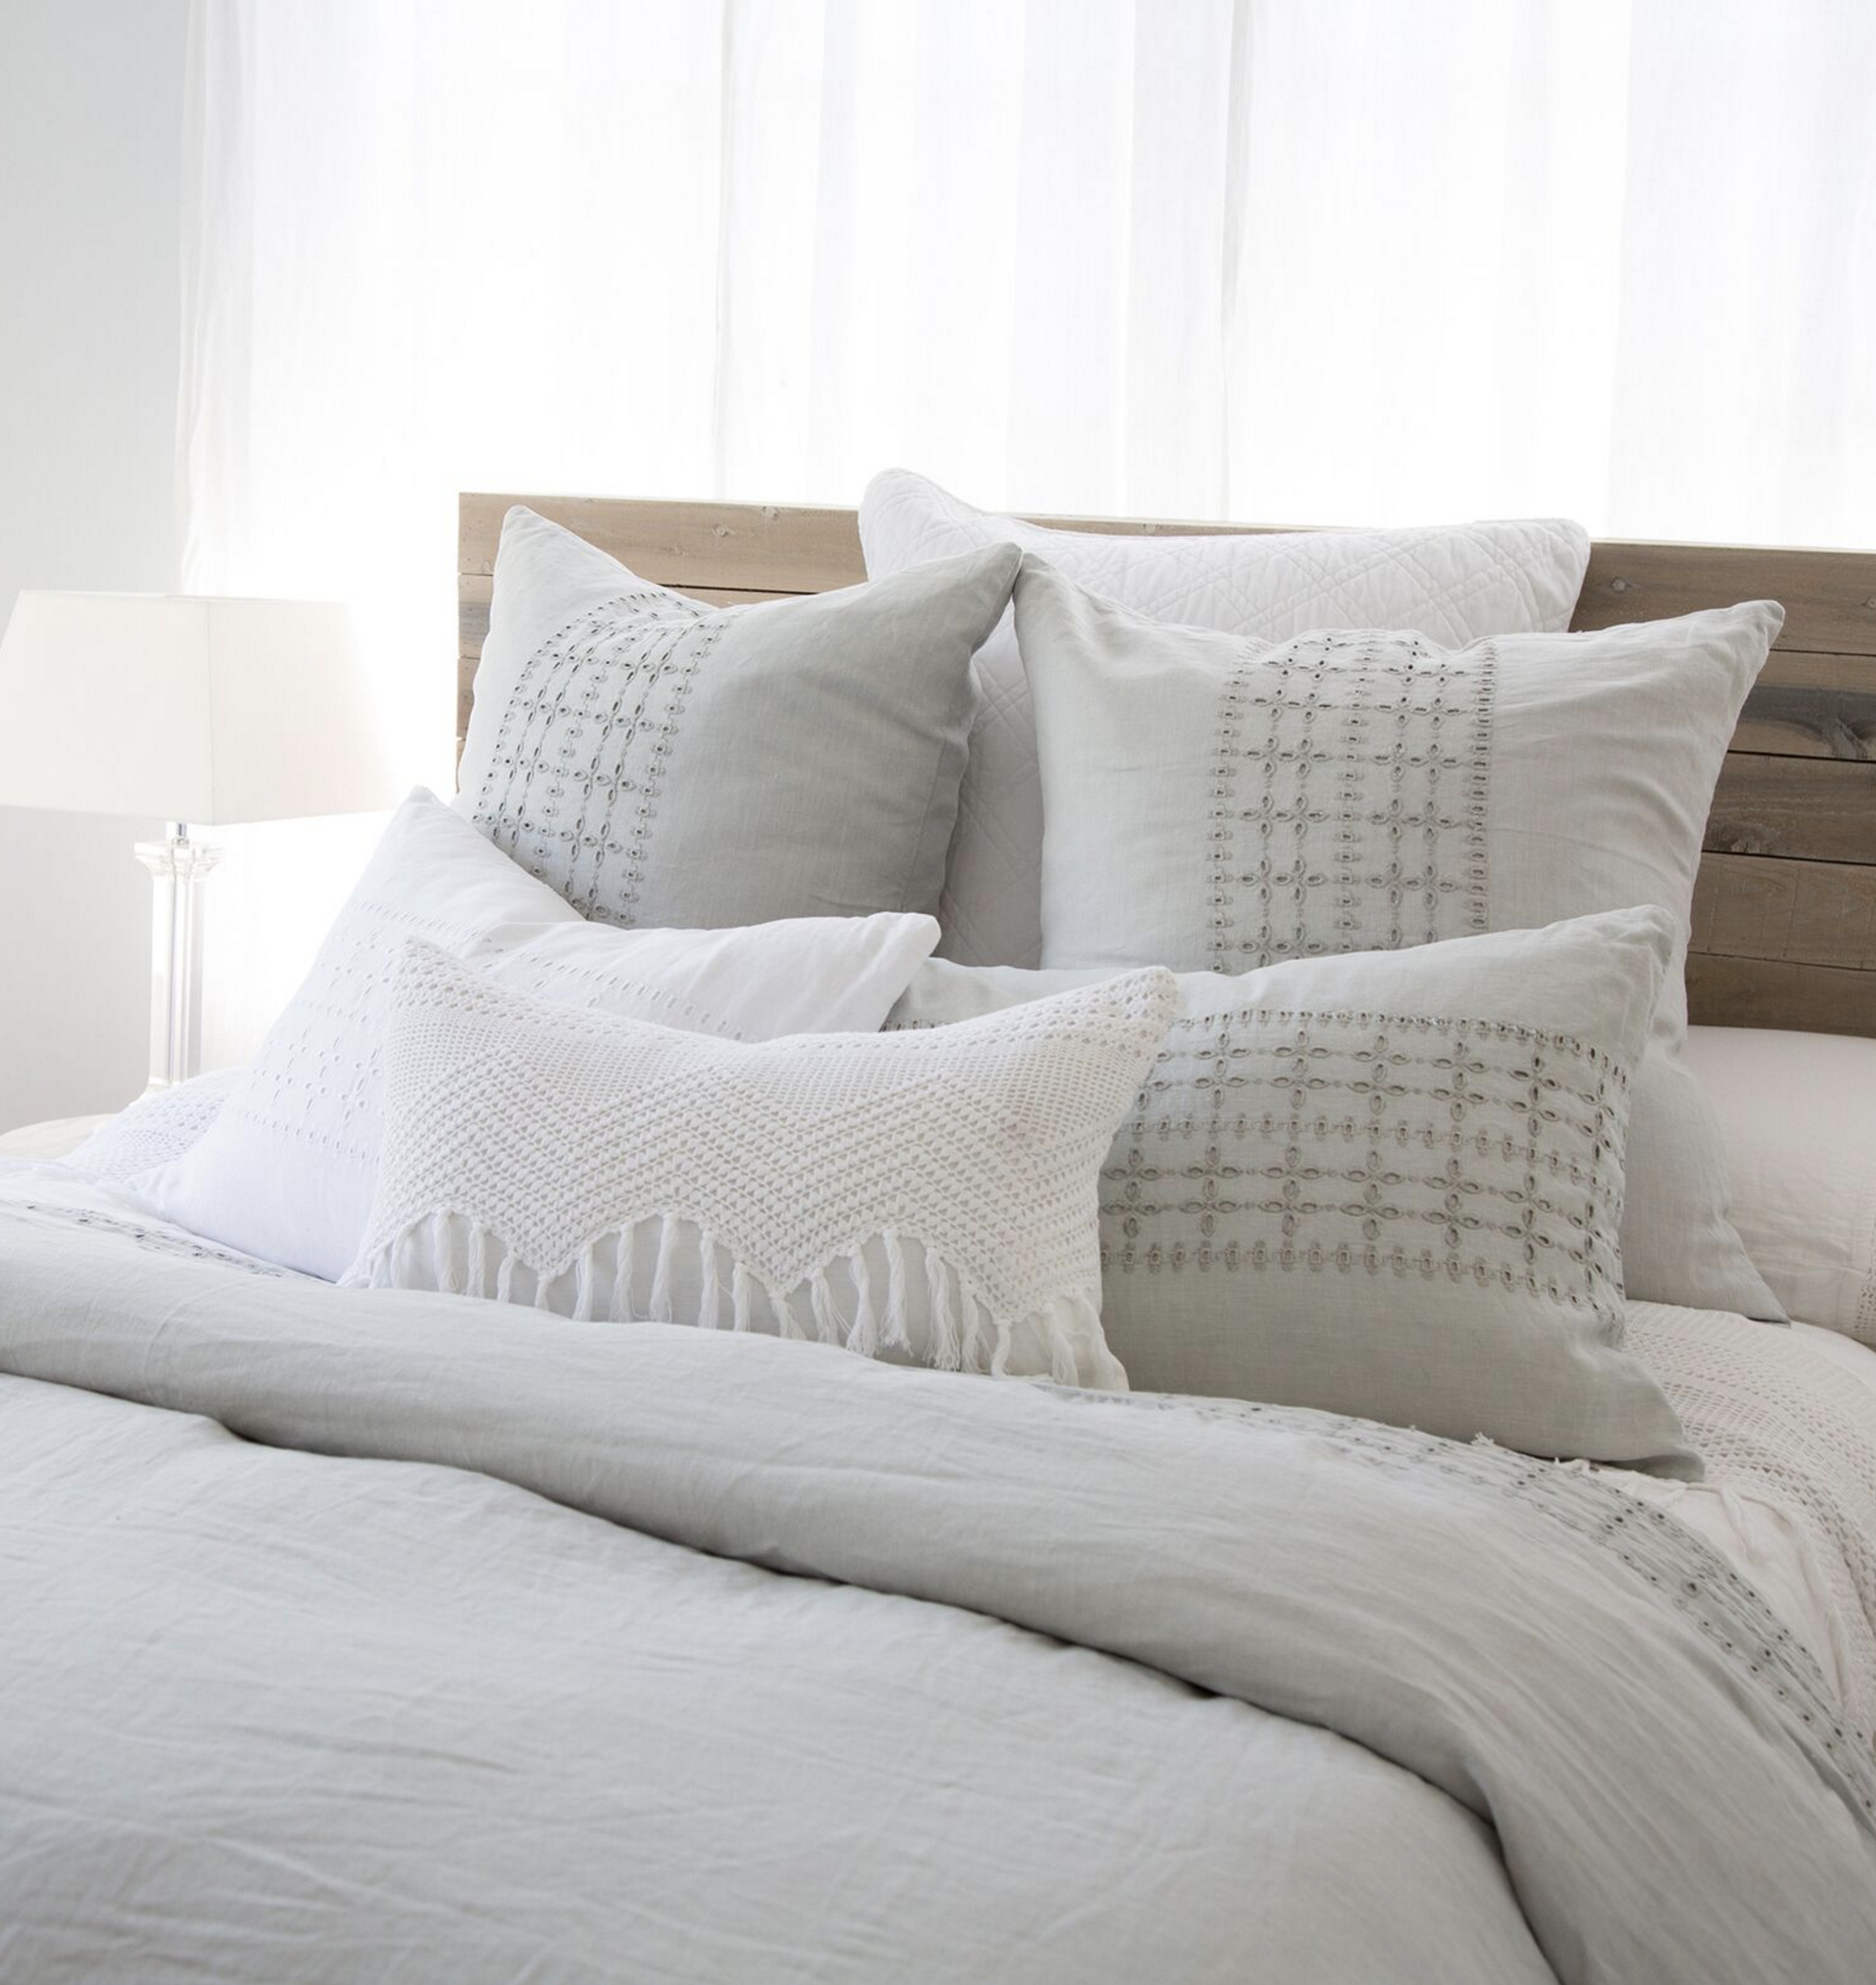 Pom Pom At Home Bedding Collection Linen Bedroom Organic Interiors Pillows Bedroom Comforter Sets Pom Pom At Home Solid Duvet